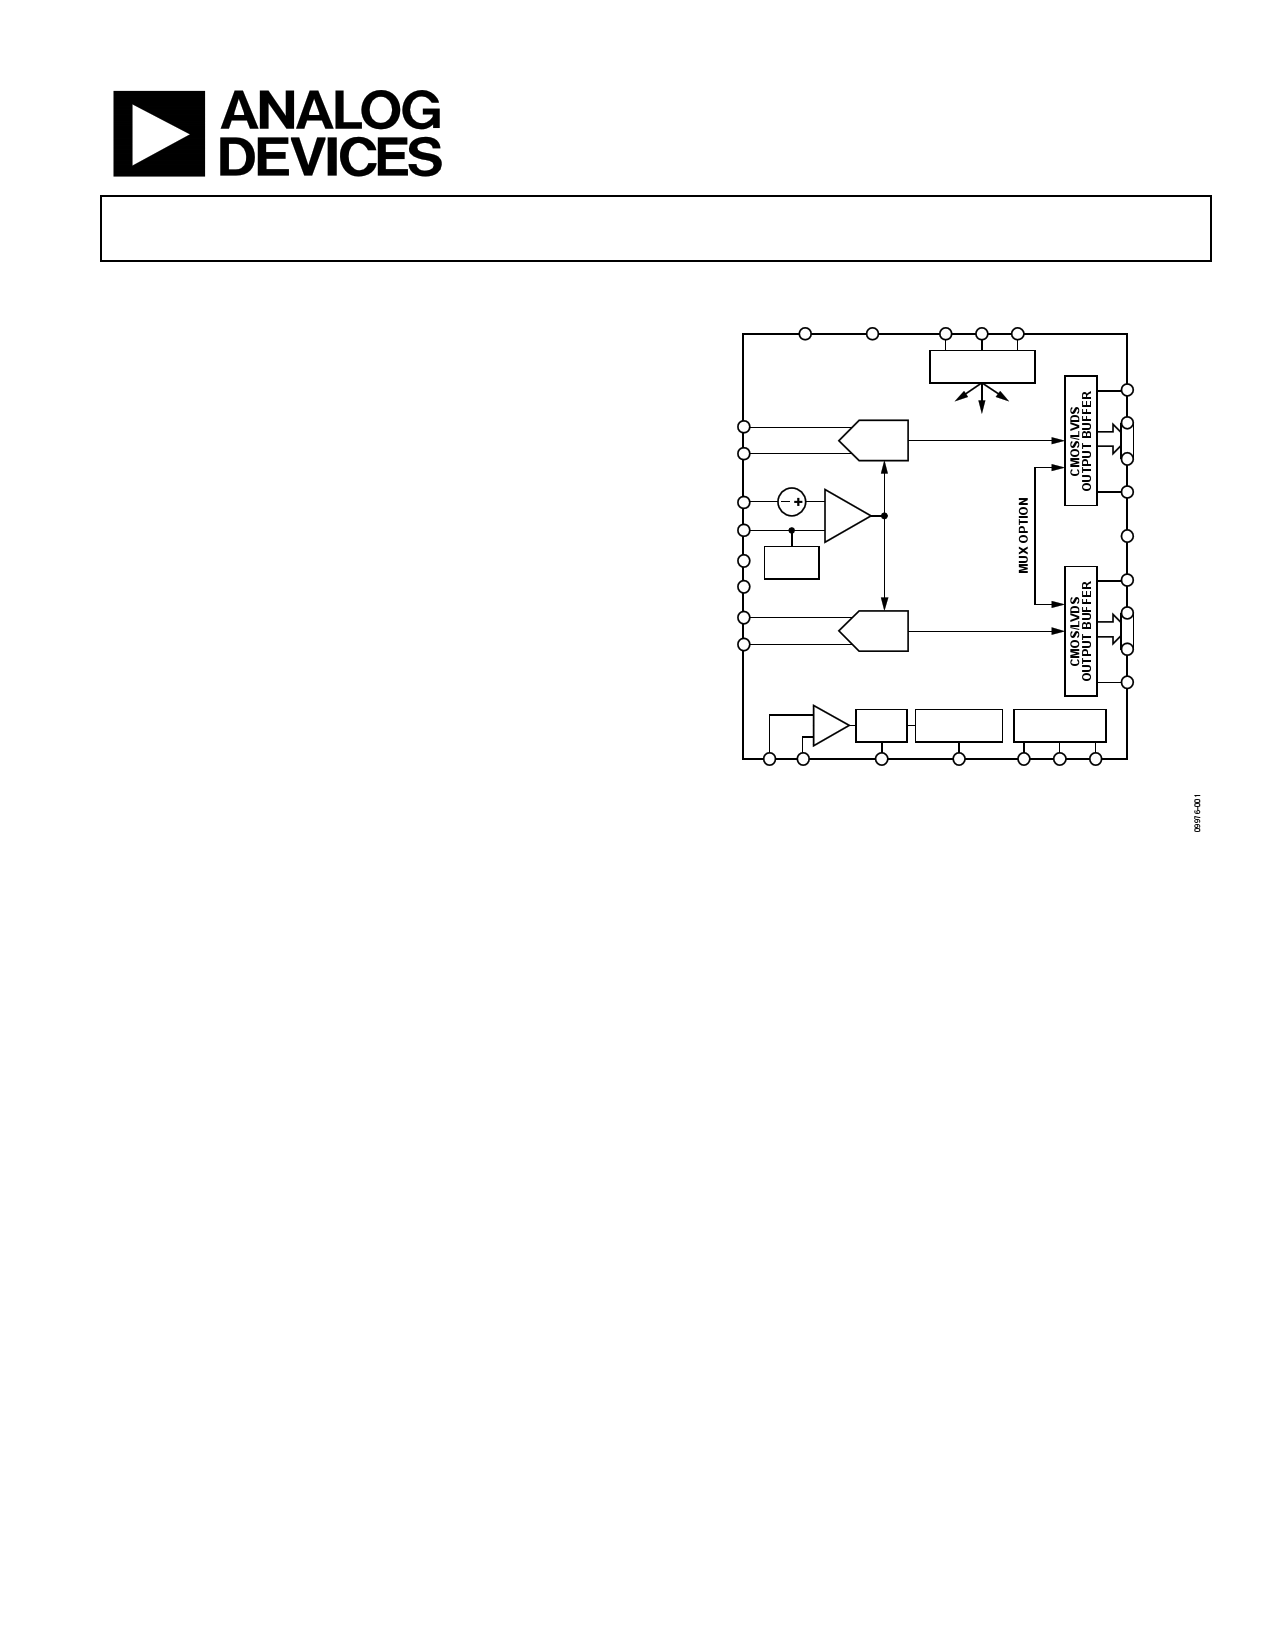 divider circuit binary options